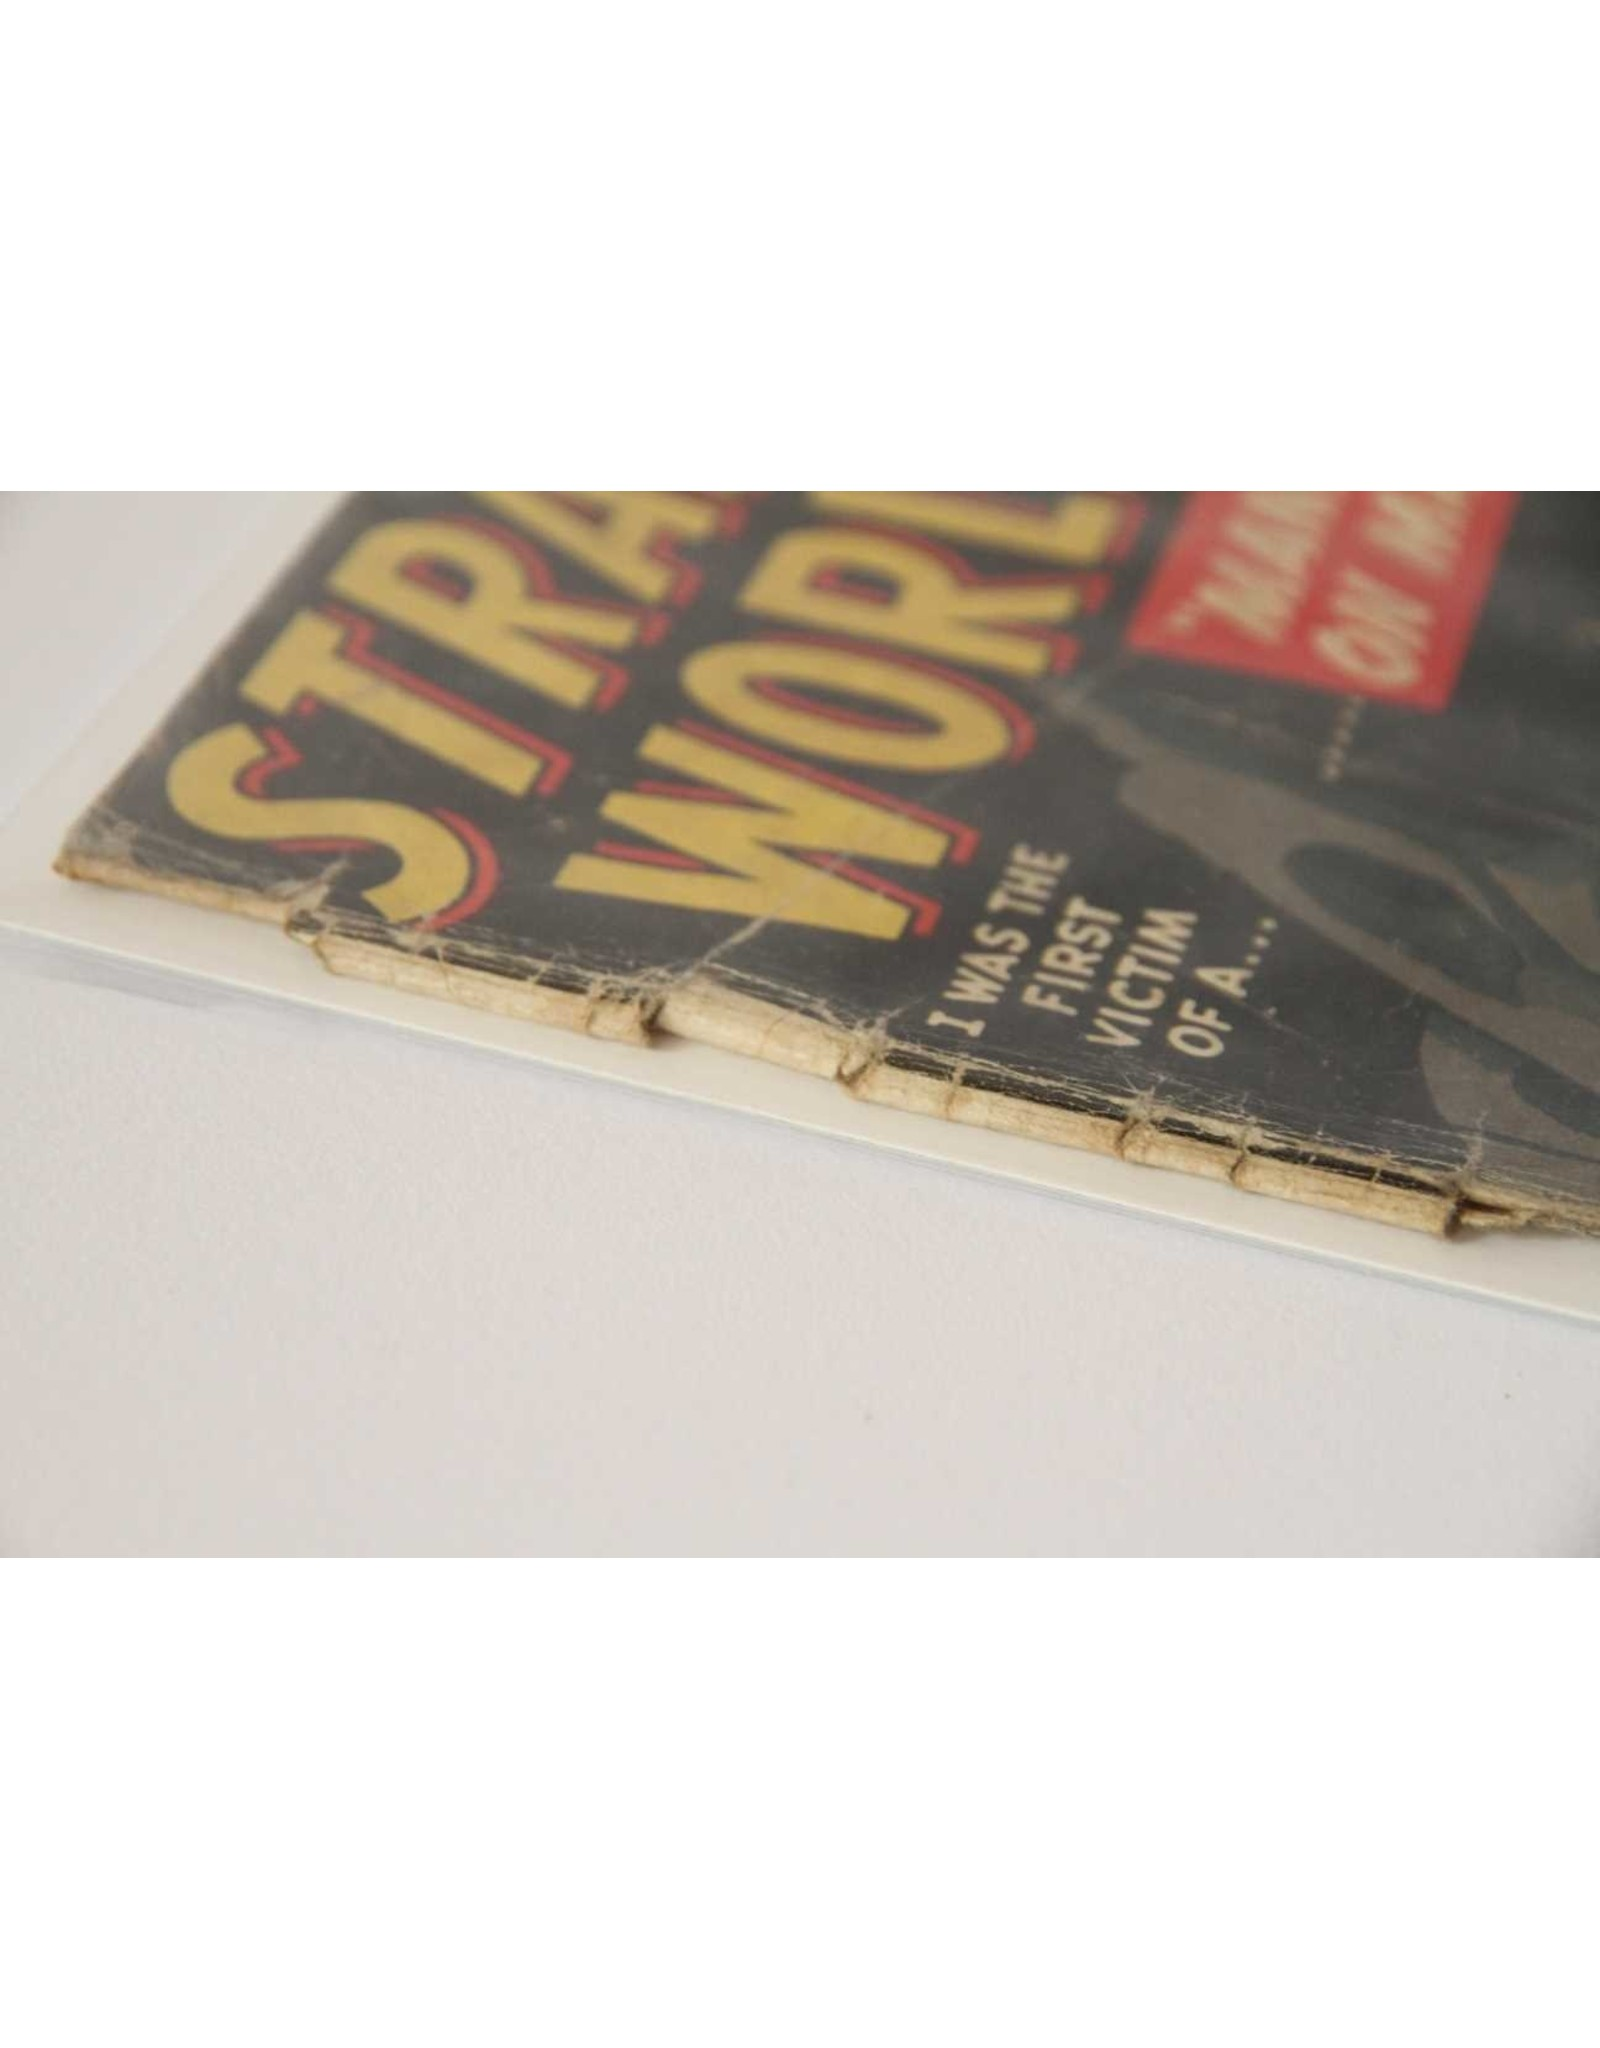 Comic- Strange Worlds, issue 4.